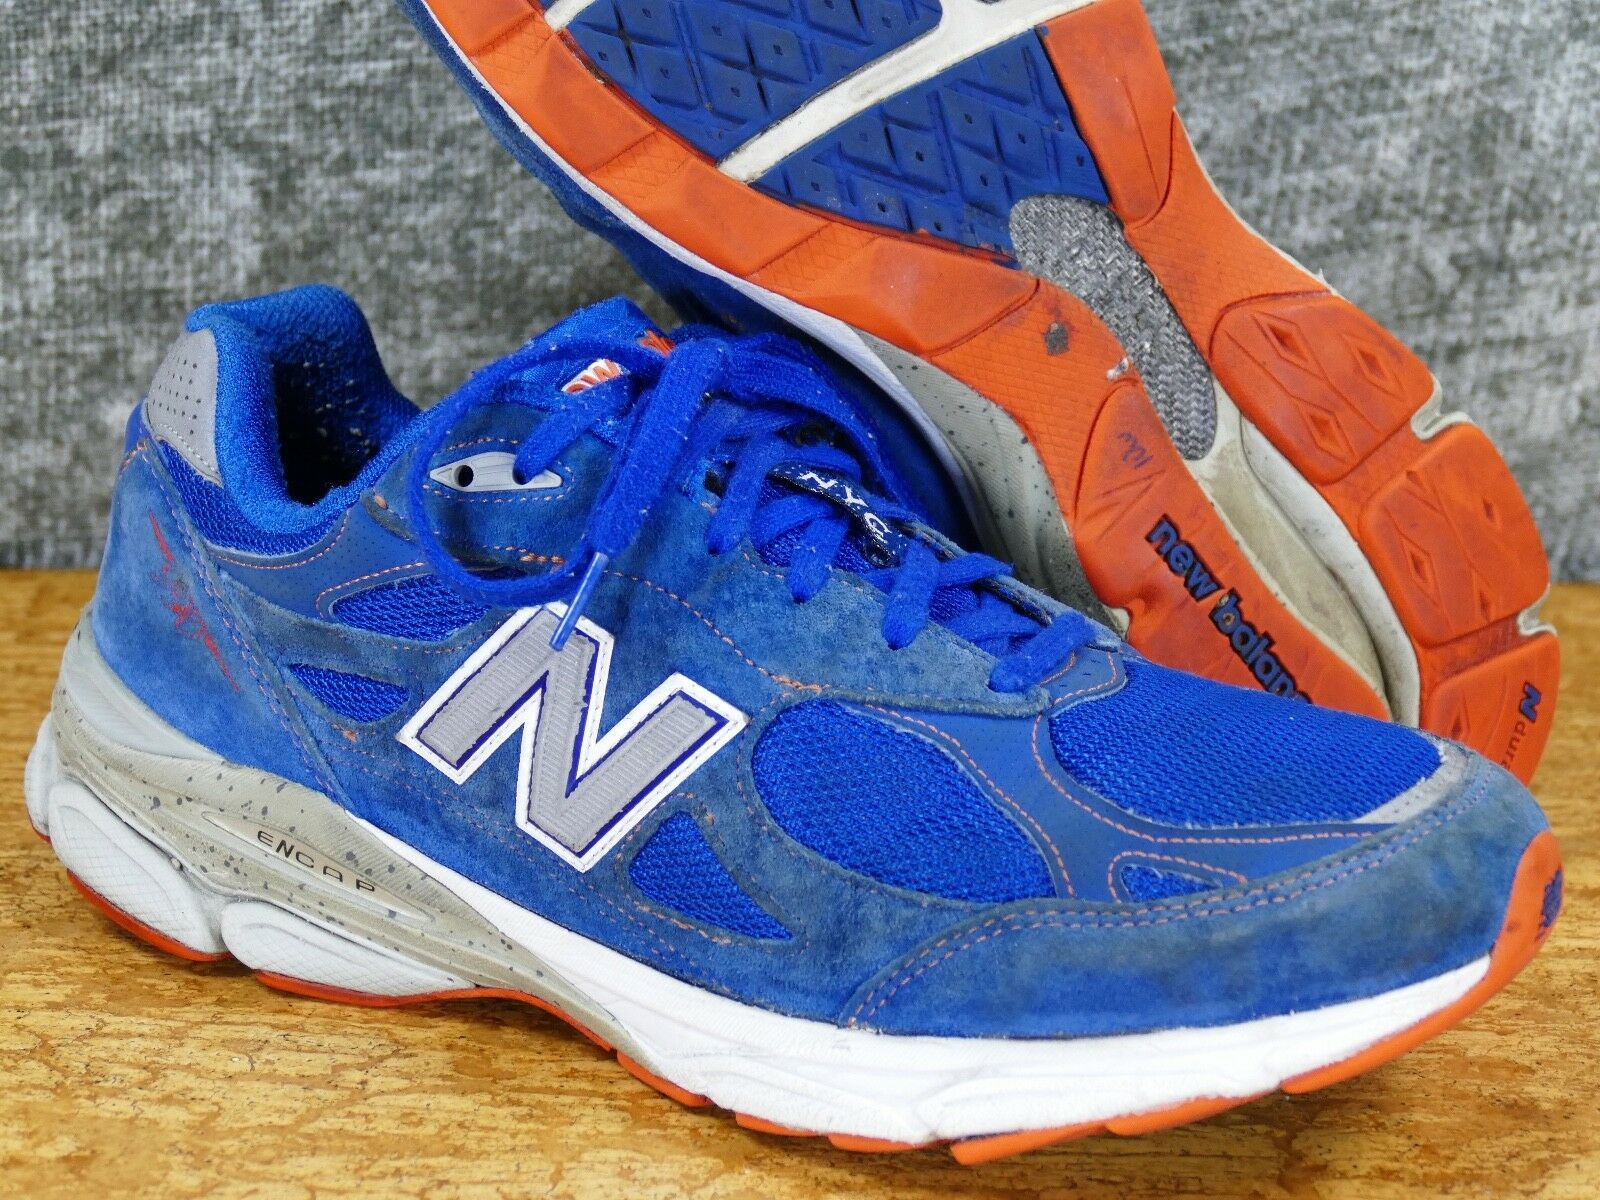 New Balance 990 v3 Men's 12 D NYC Marathon - suede blue york 992 993 M990NM3